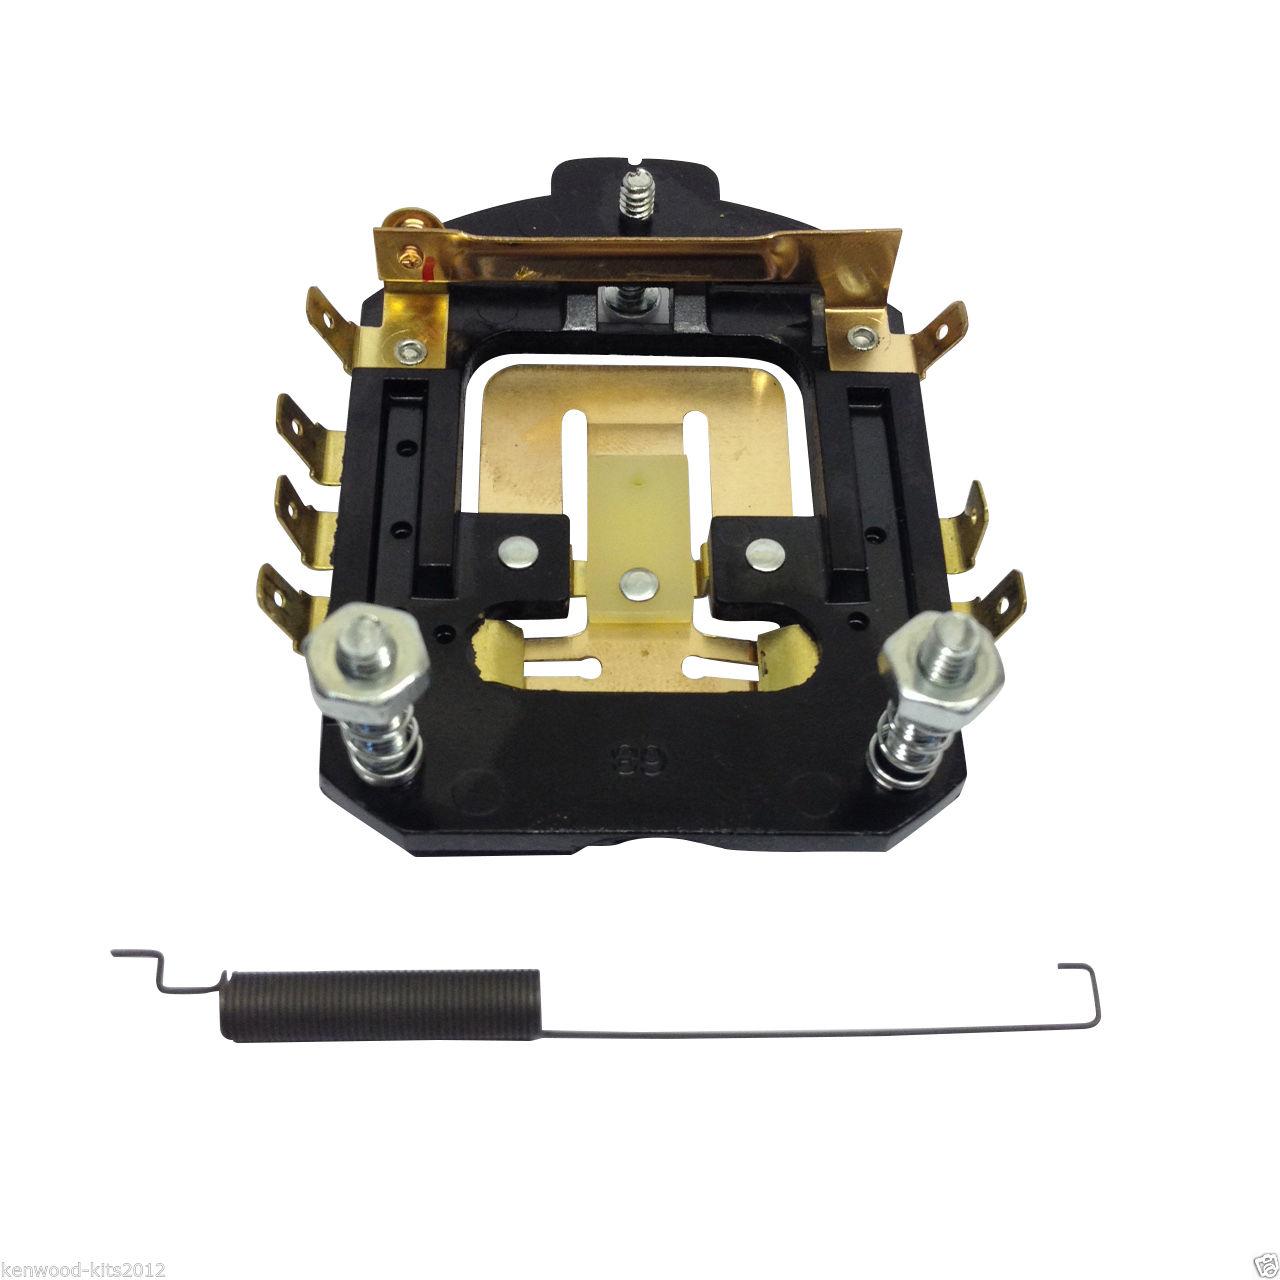 Kitchenaid stand mixer speed control plate with spring lana 39 s kenwood kitchenaid spares - Kitchenaid blender parts uk ...